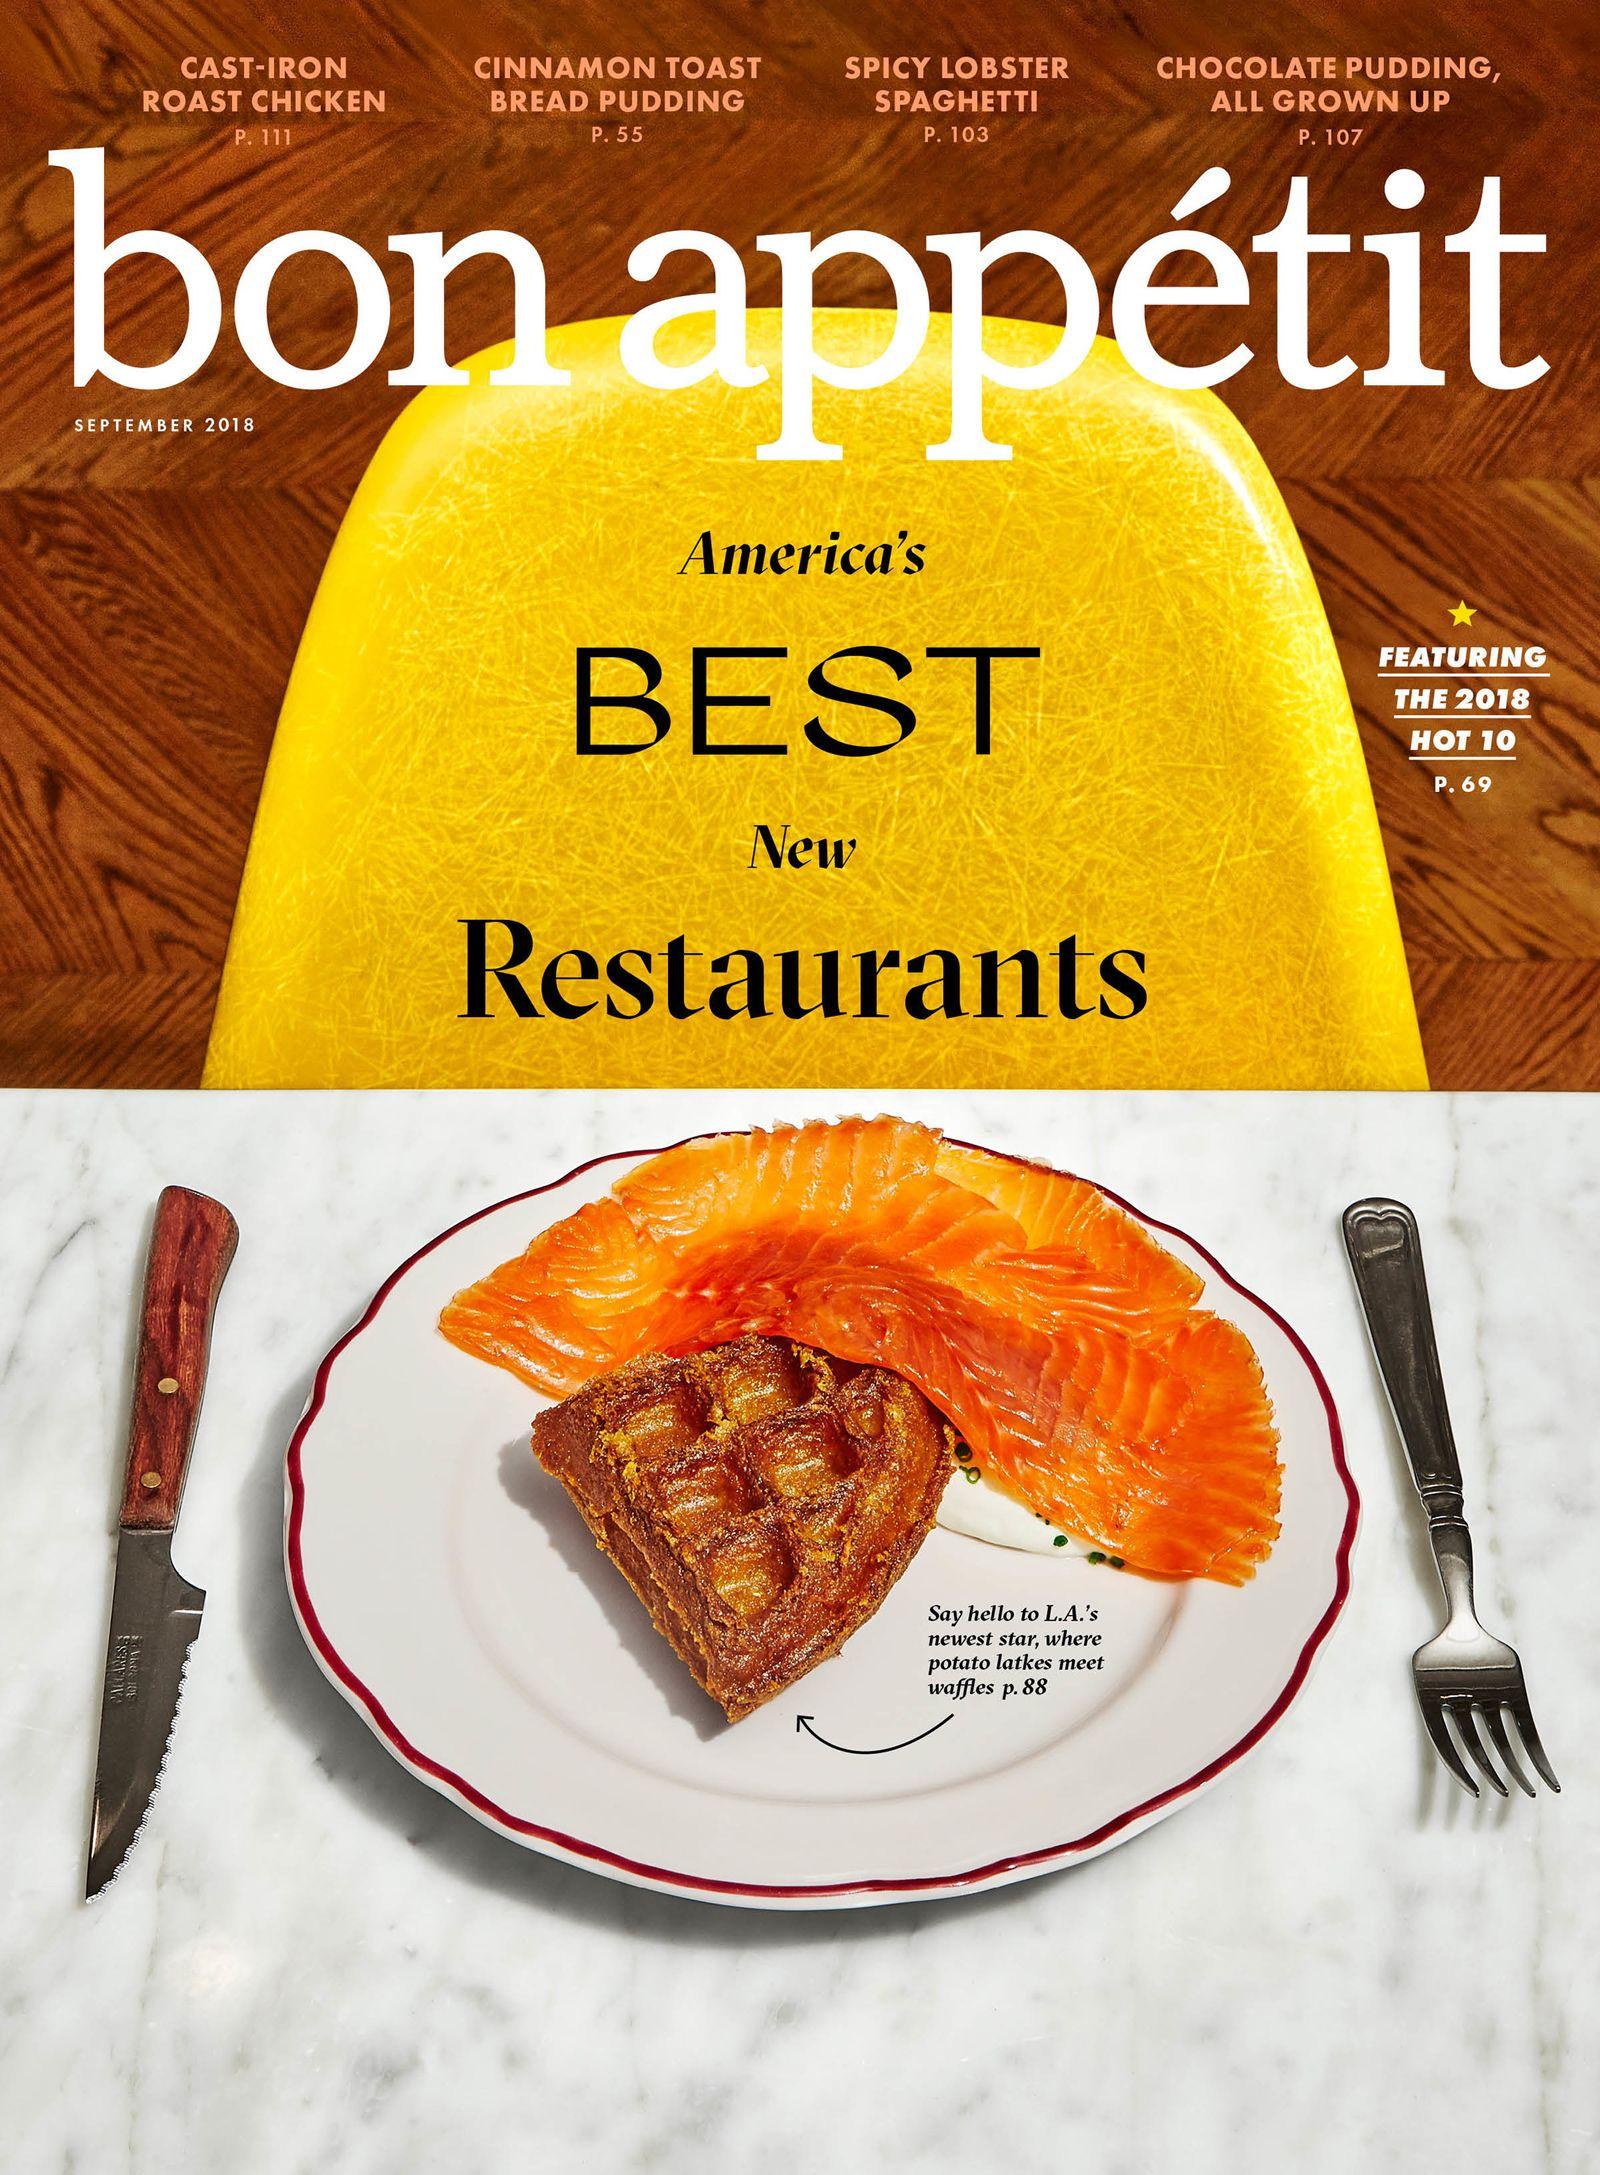 Bon Appétit Reveals The Hot 10: America's Best New Restaurants 2018